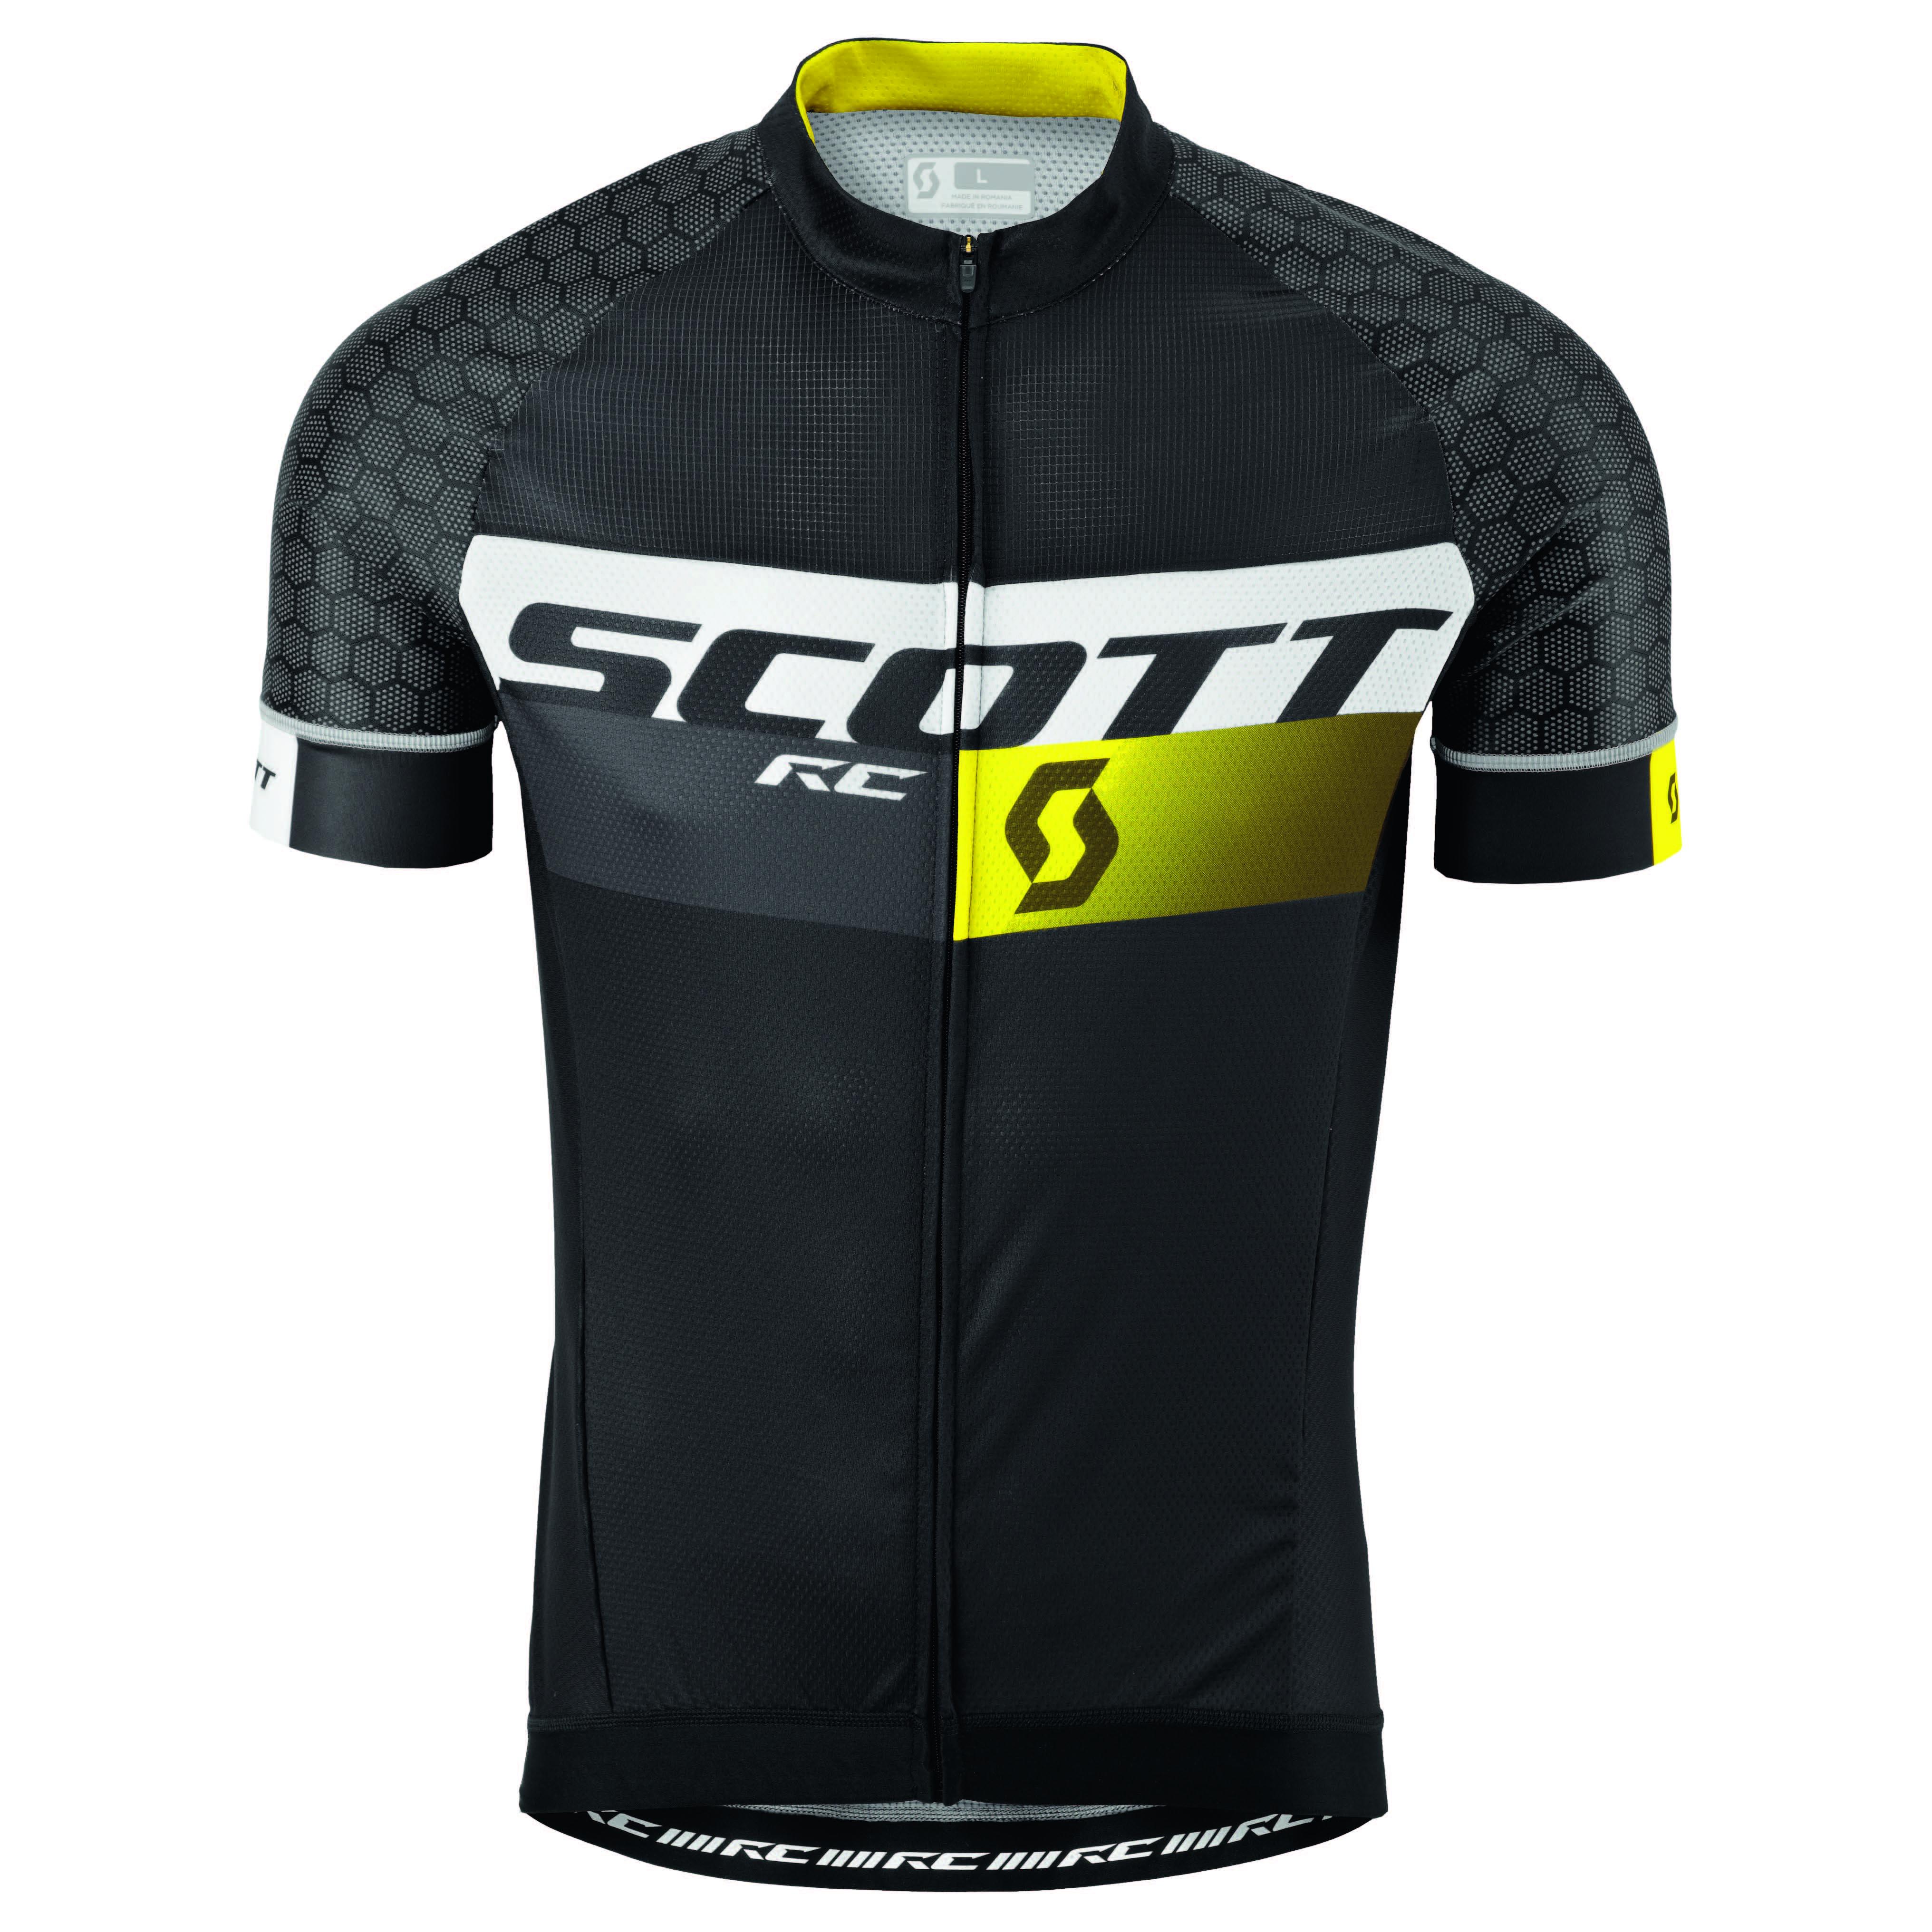 5e3c65c84 Scott ProTec clothing aims to end road rash - Cycling Weekly